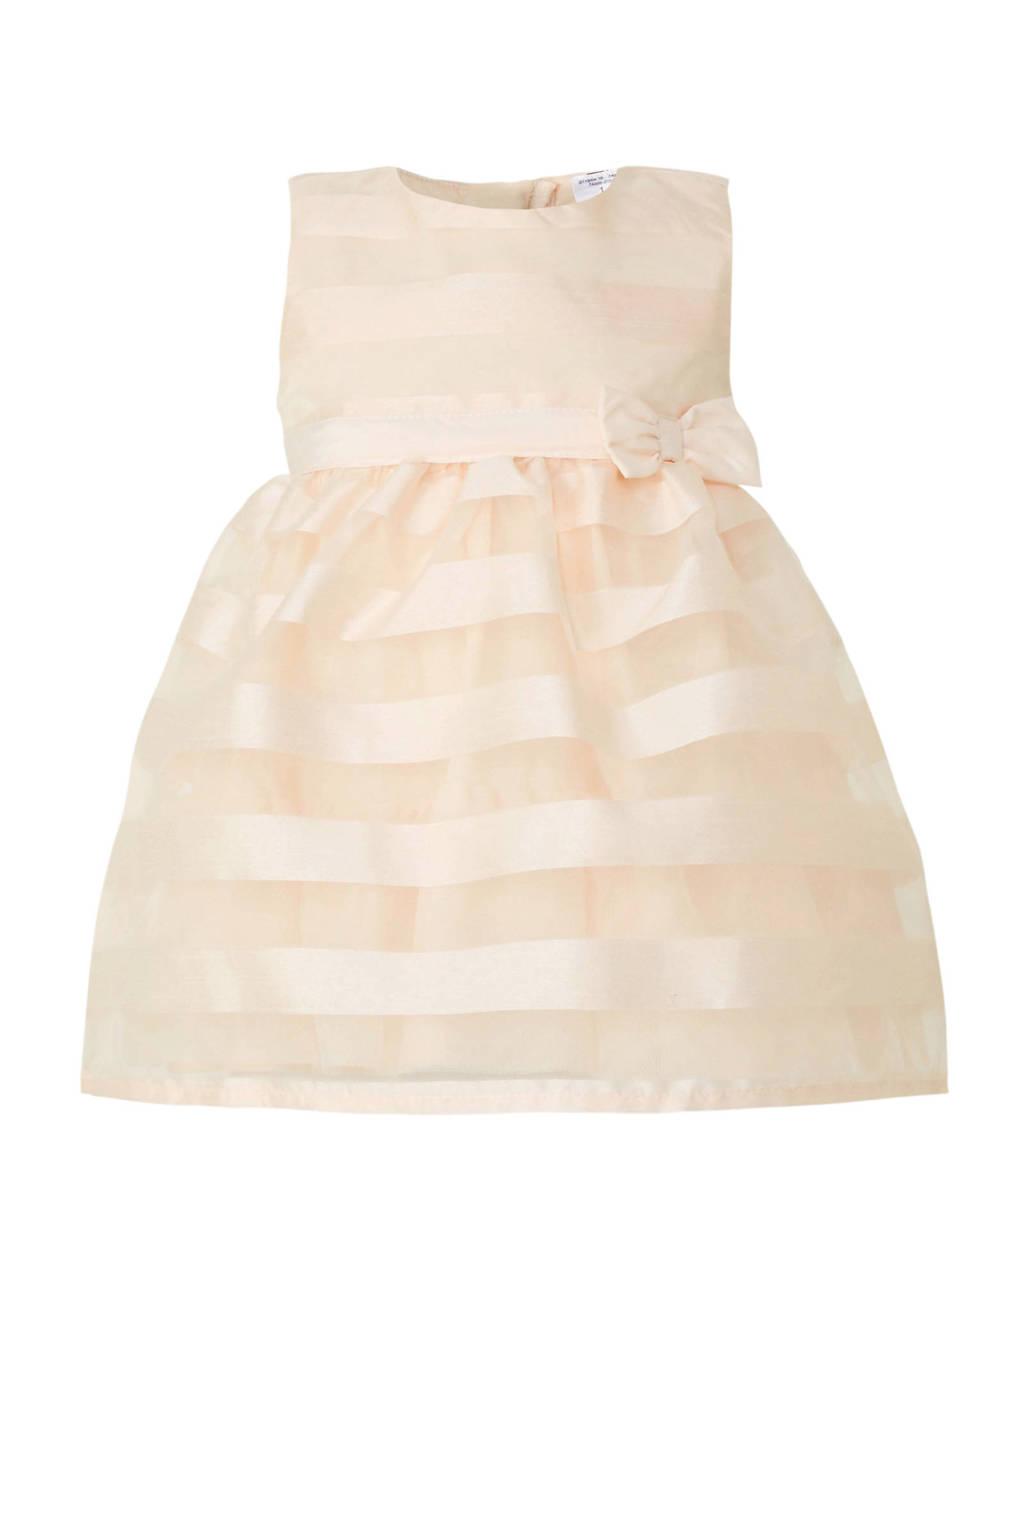 C&A Baby Club gestreepte jurk met mesh zalm, Zalm